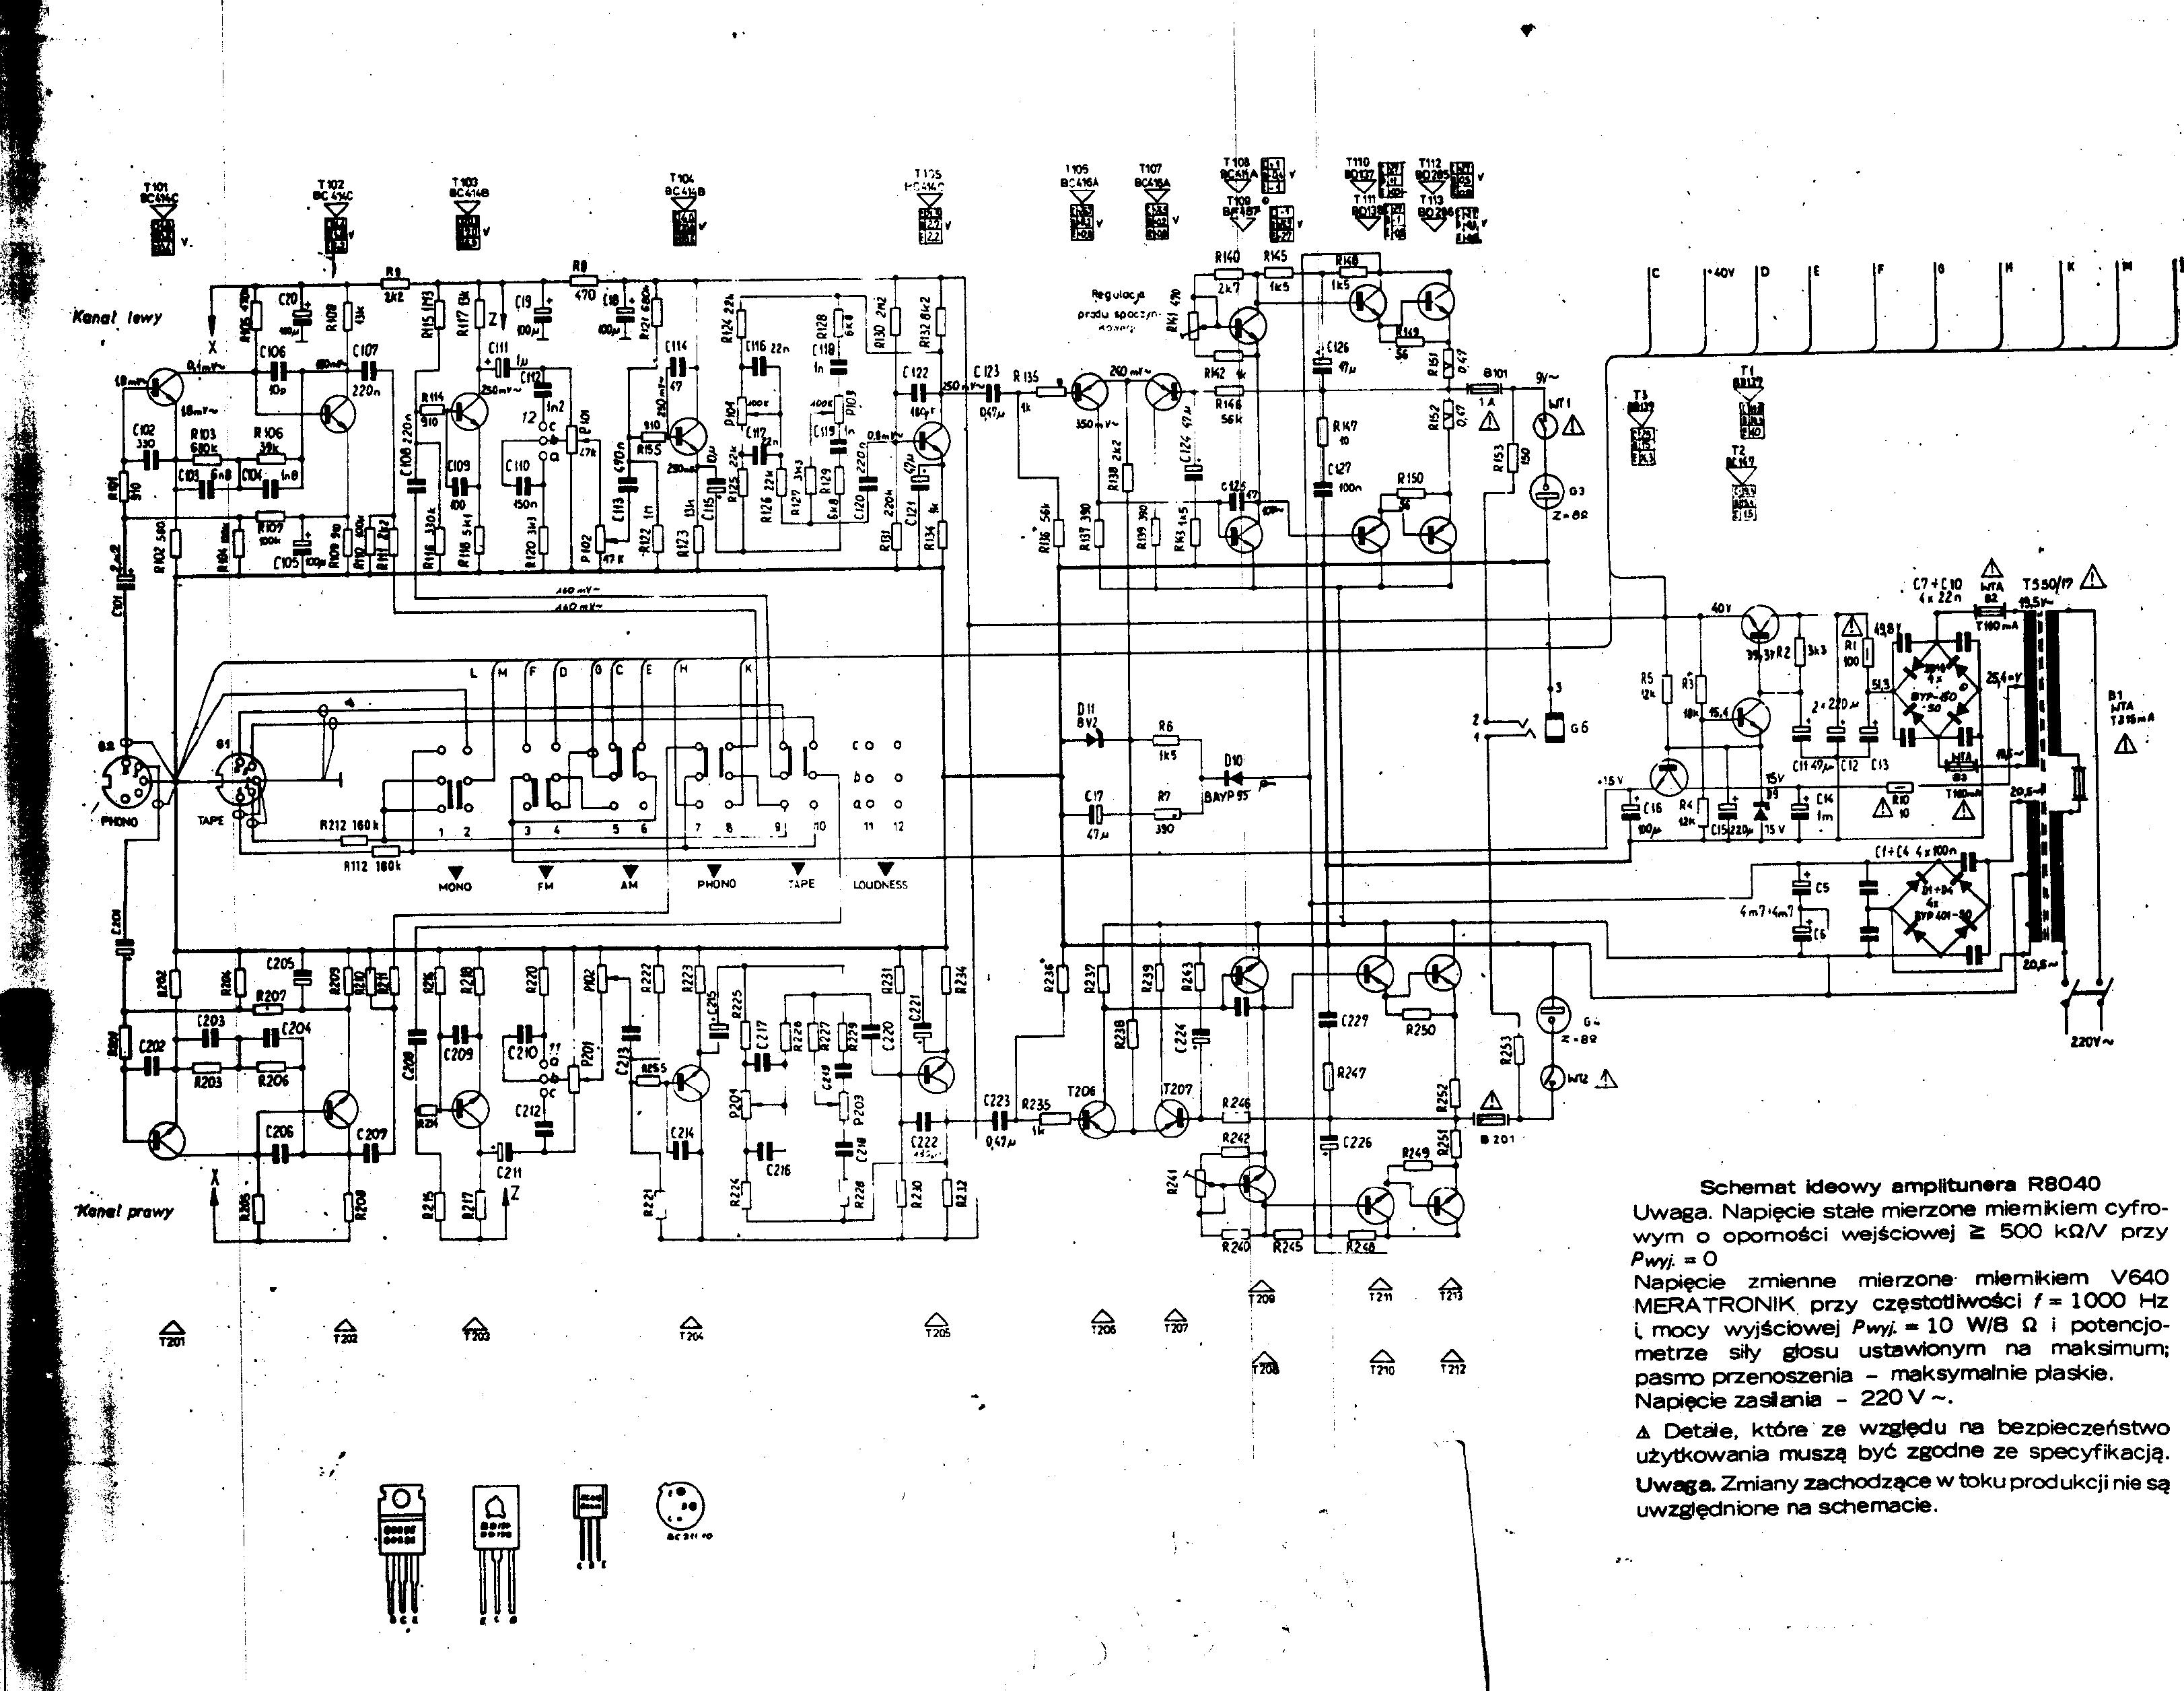 Amplituner unitra R8040 - Brak niskich ton�w w jednym kanale